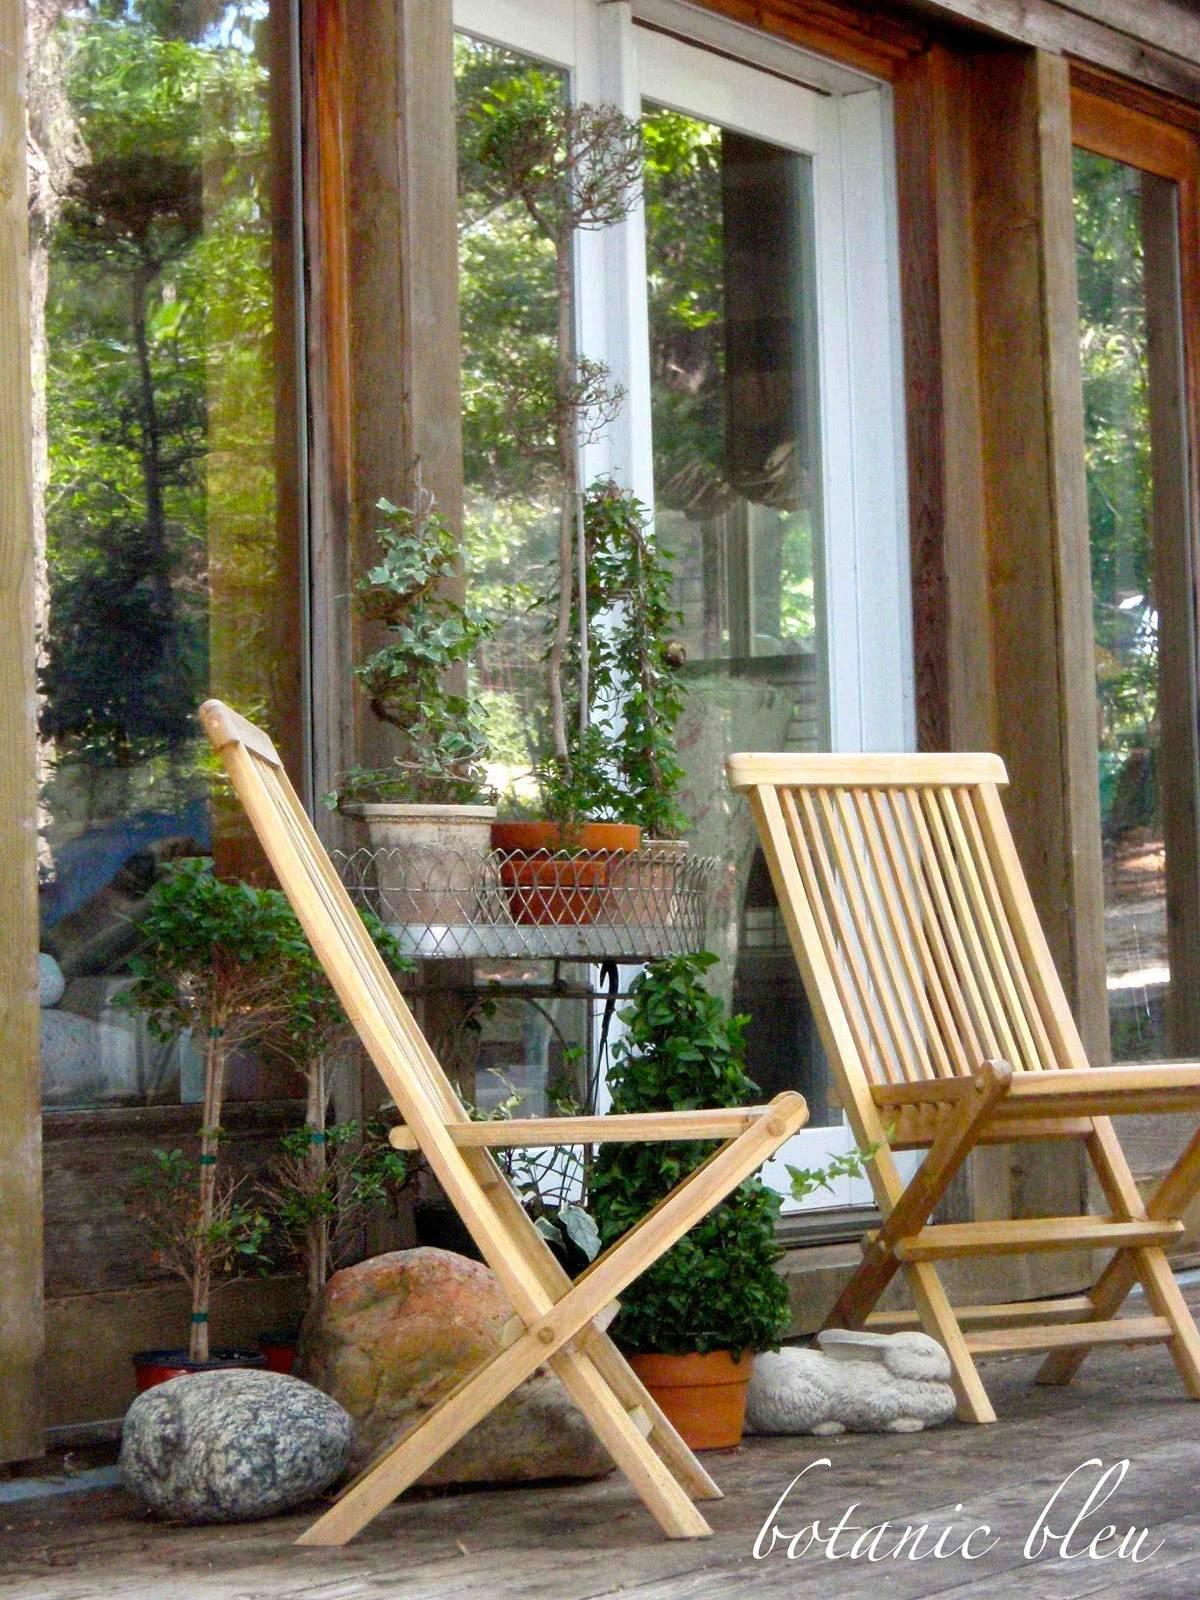 Botanic Bleu French Country Style Deck